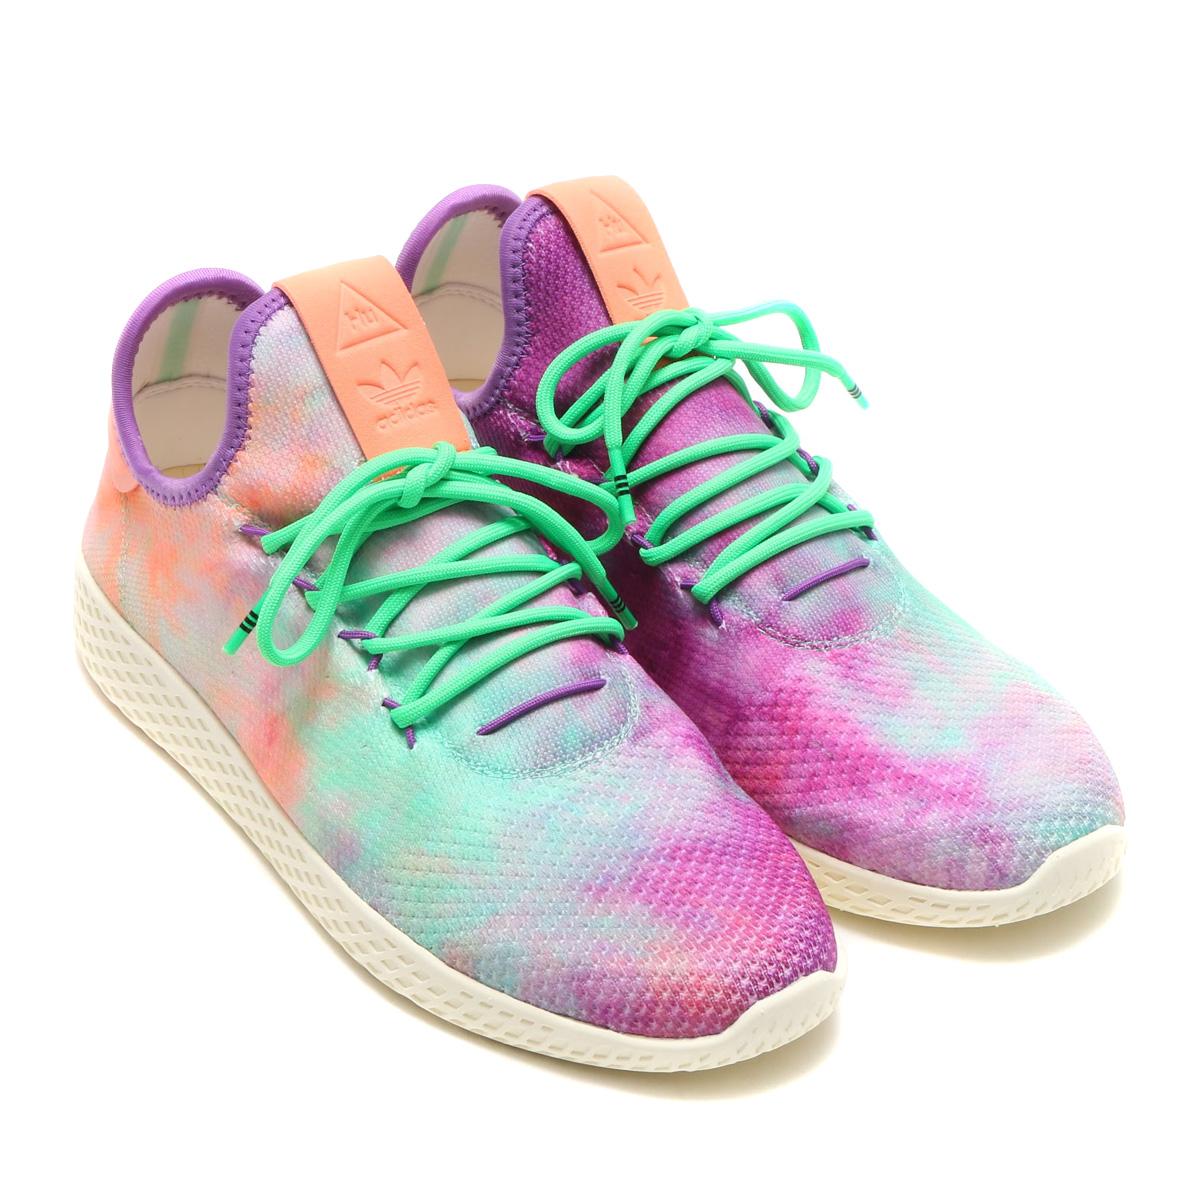 adidas Originals PW HU HOLI TENNIS HU MC (アディダス オリジナルス ファレル ウィリアムス HU HOLI テニスHU MC) Chalk Coral / Supplier Color / Supplier Color【メンズ スニーカー】18SS-S